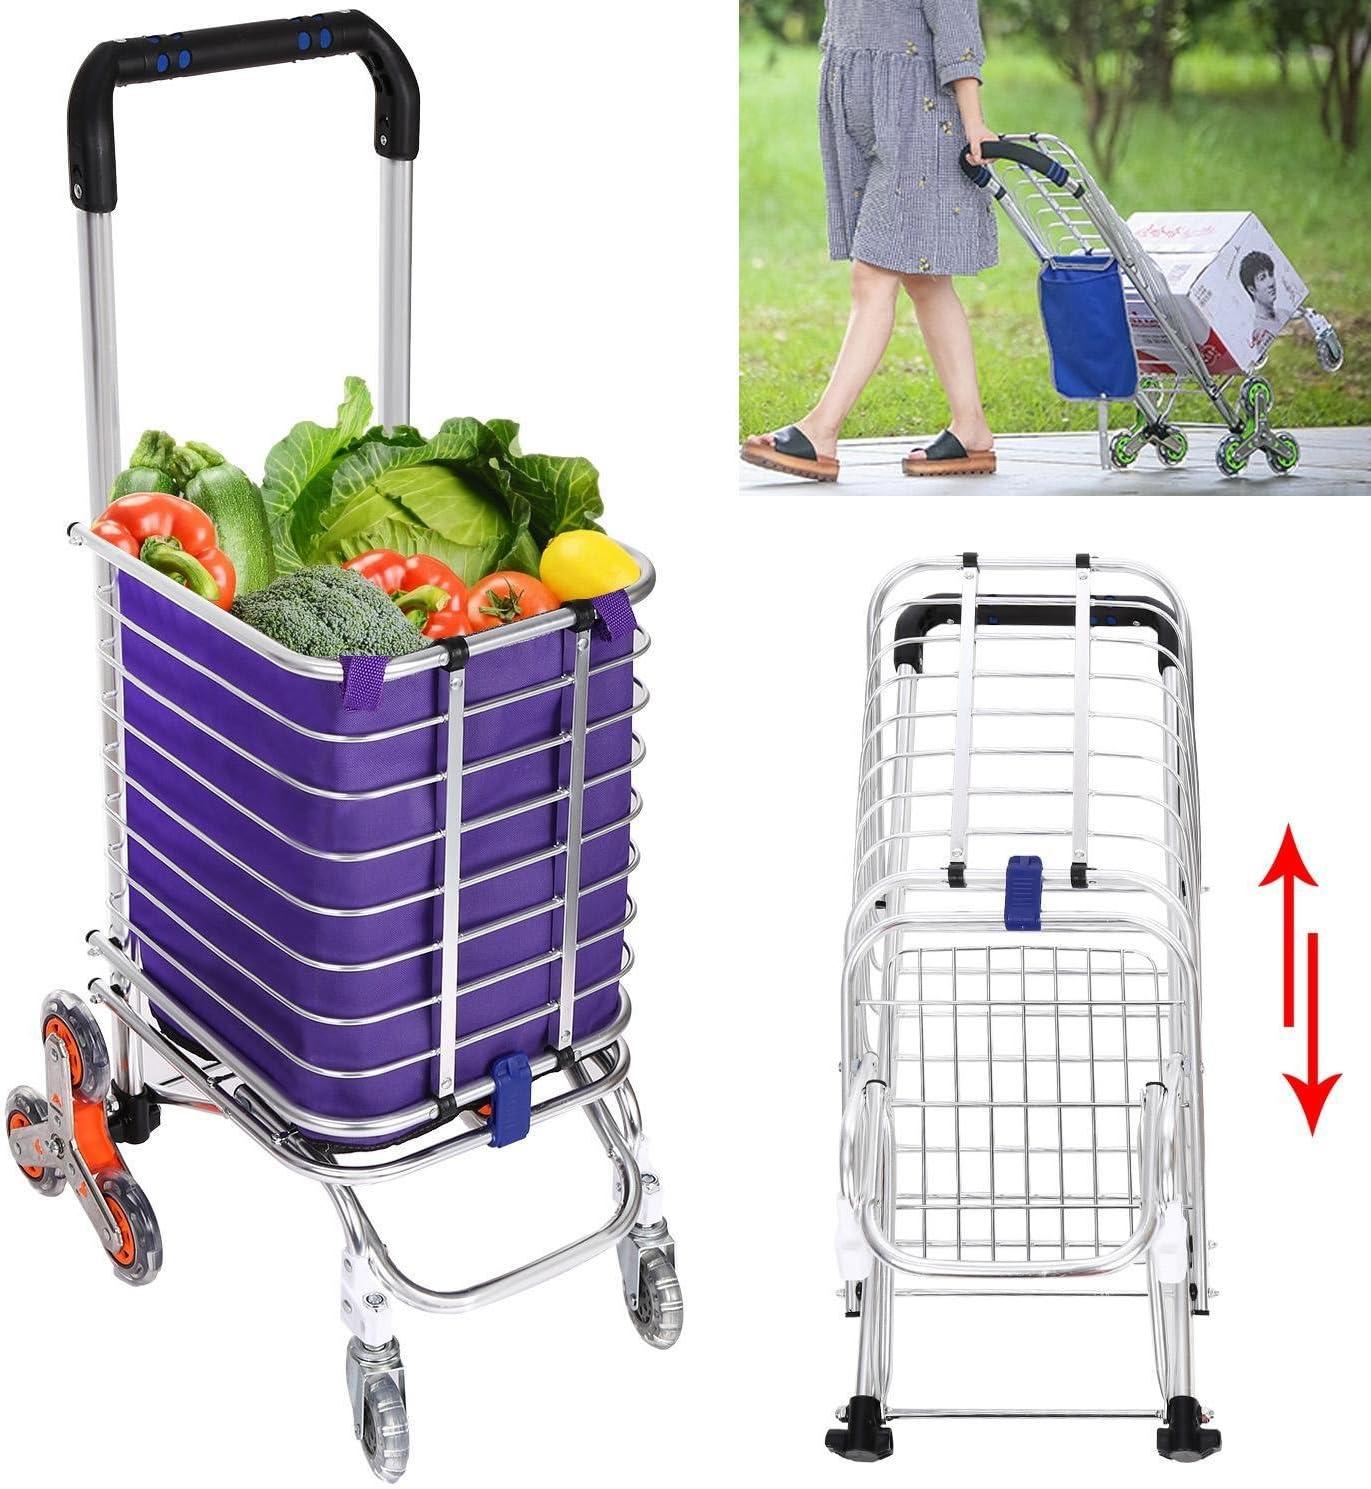 Hindom Portable Folding Travel Shopping Cart Aluminum Shopping Cart with Swivel Wheels Grocery Laundry Utility Cart US Stock Purple